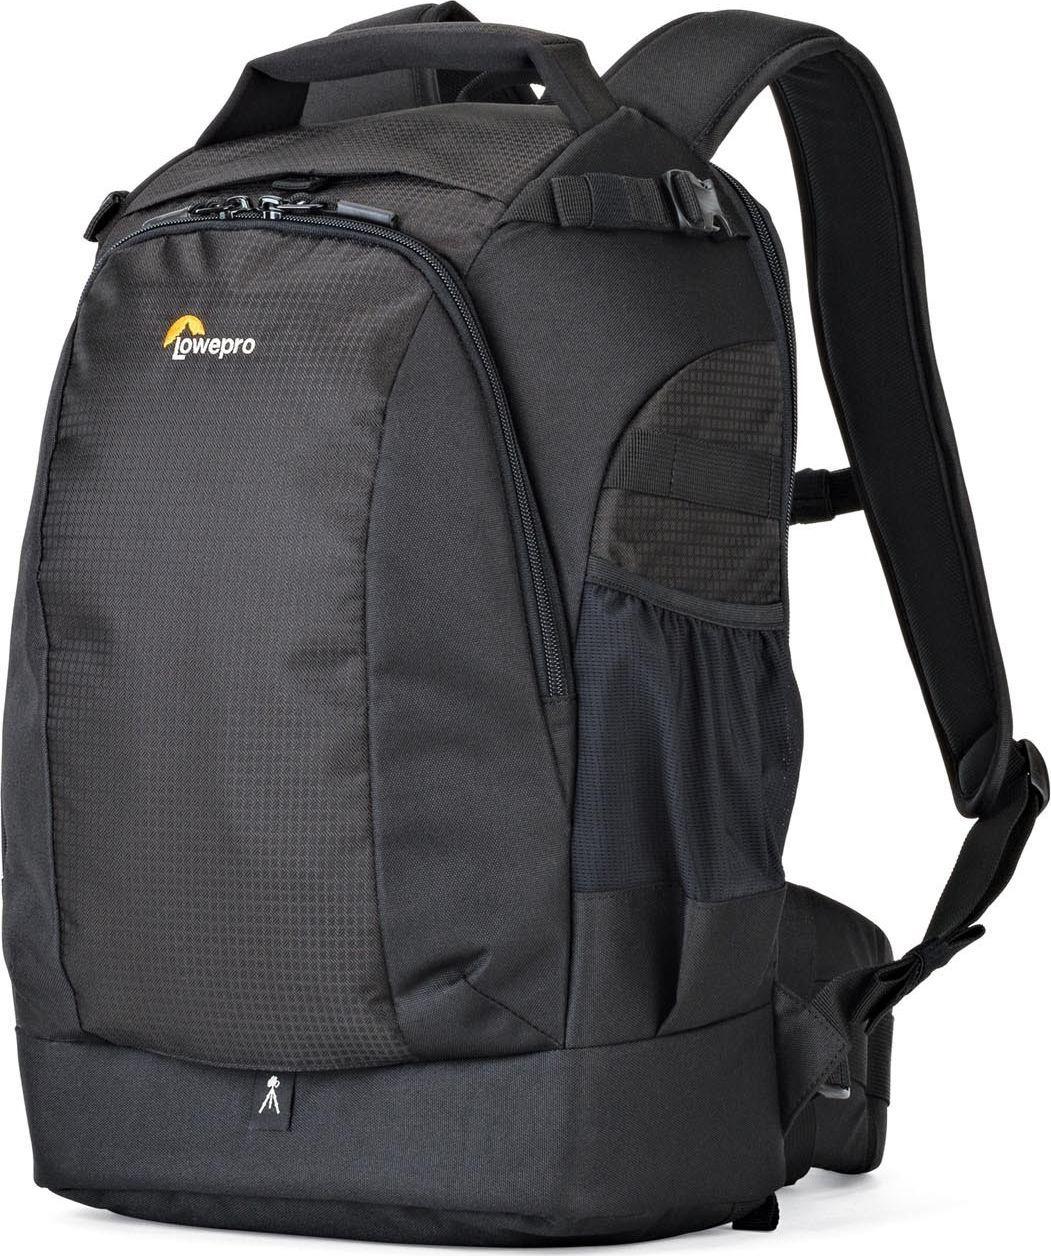 Рюкзак Lowepro Flipside 400 AW II, LP37129-PWW, черный